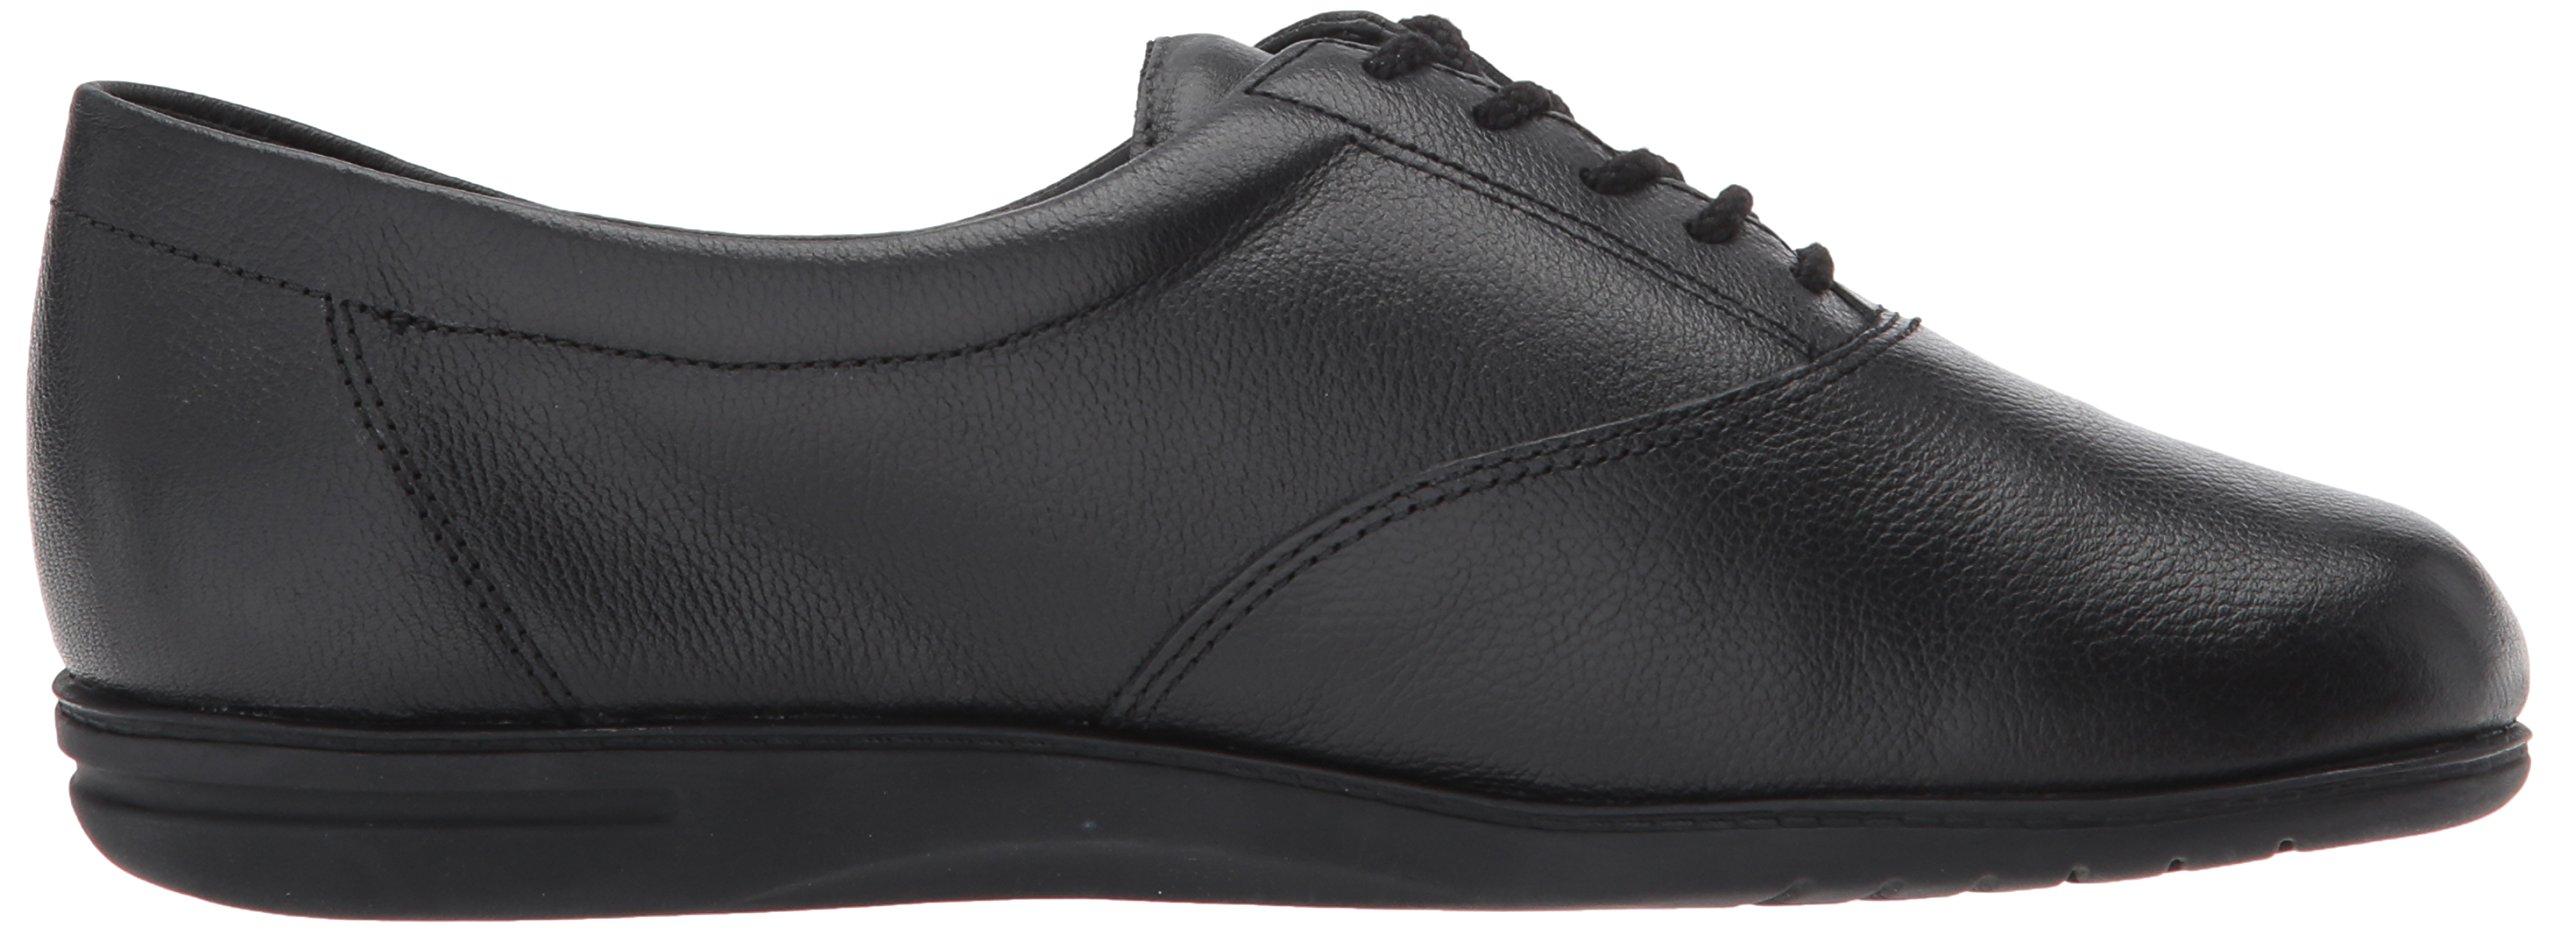 Easy Spirit Women's ESMOTION8 Shoe, black, 8.5 W US by Easy Spirit (Image #7)